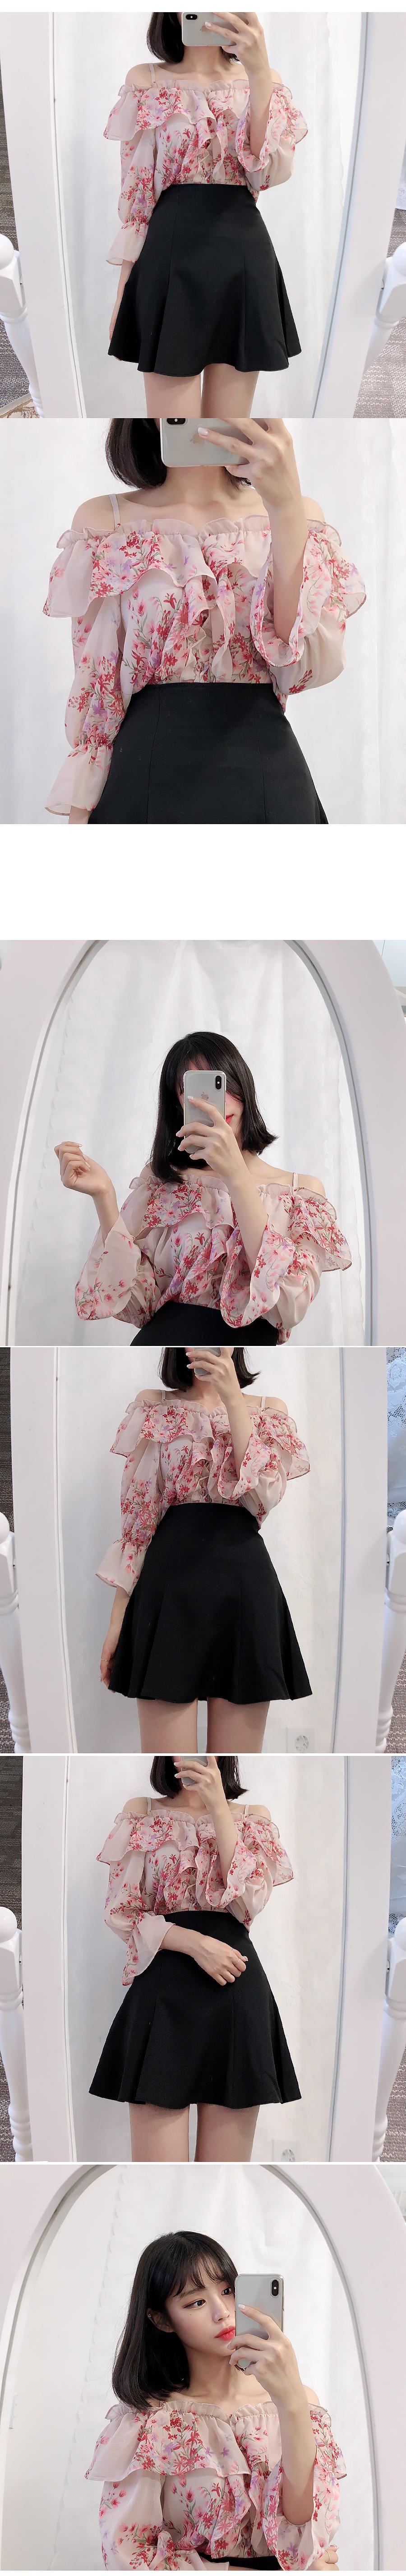 Bling door flower shoulder blouse